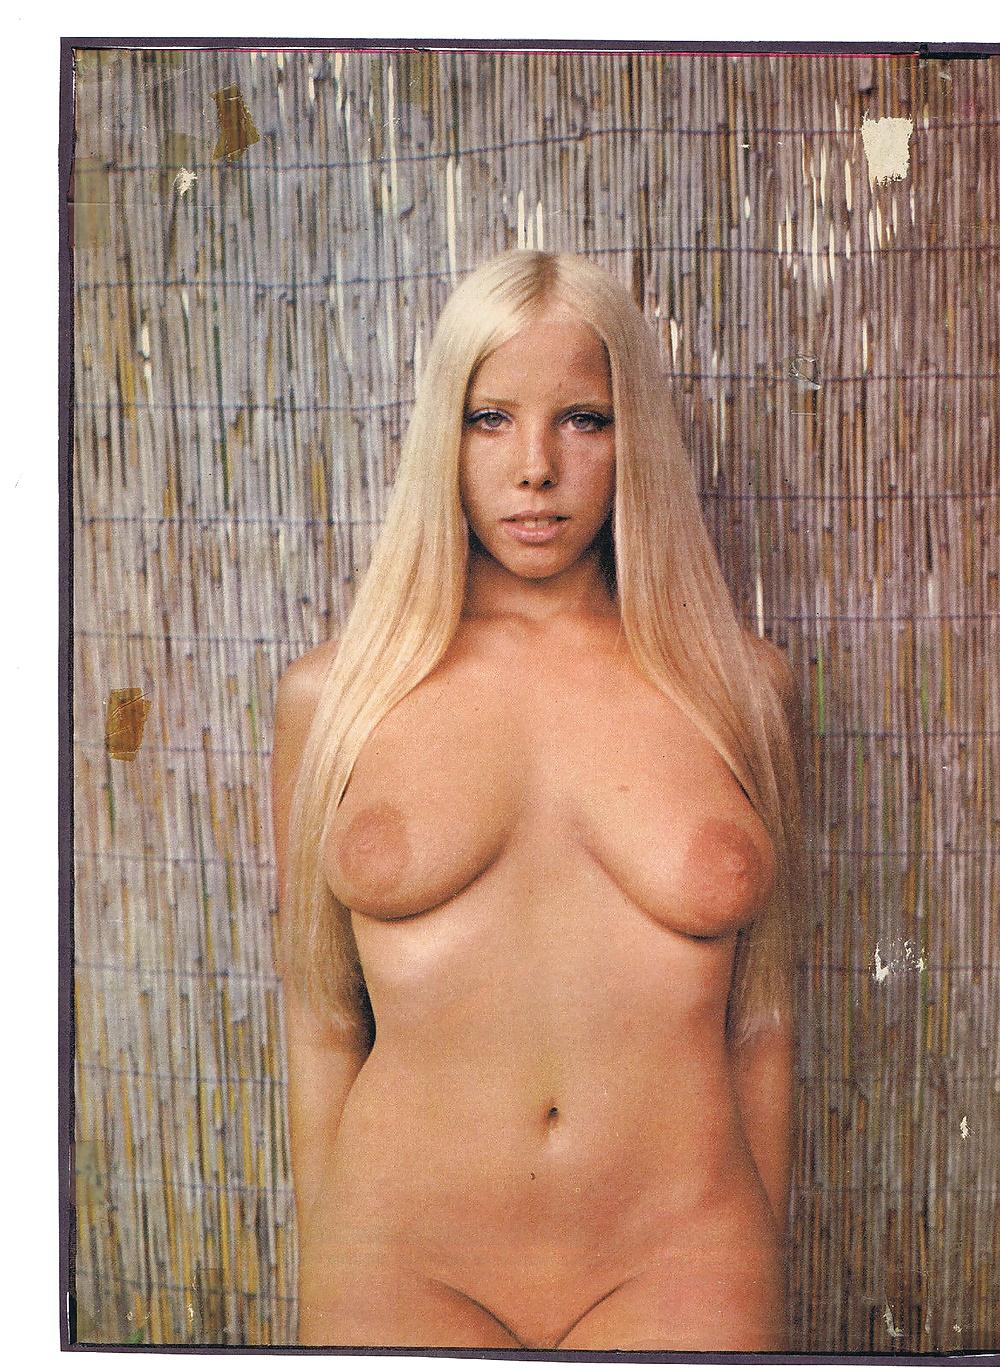 Free jap breast bondage